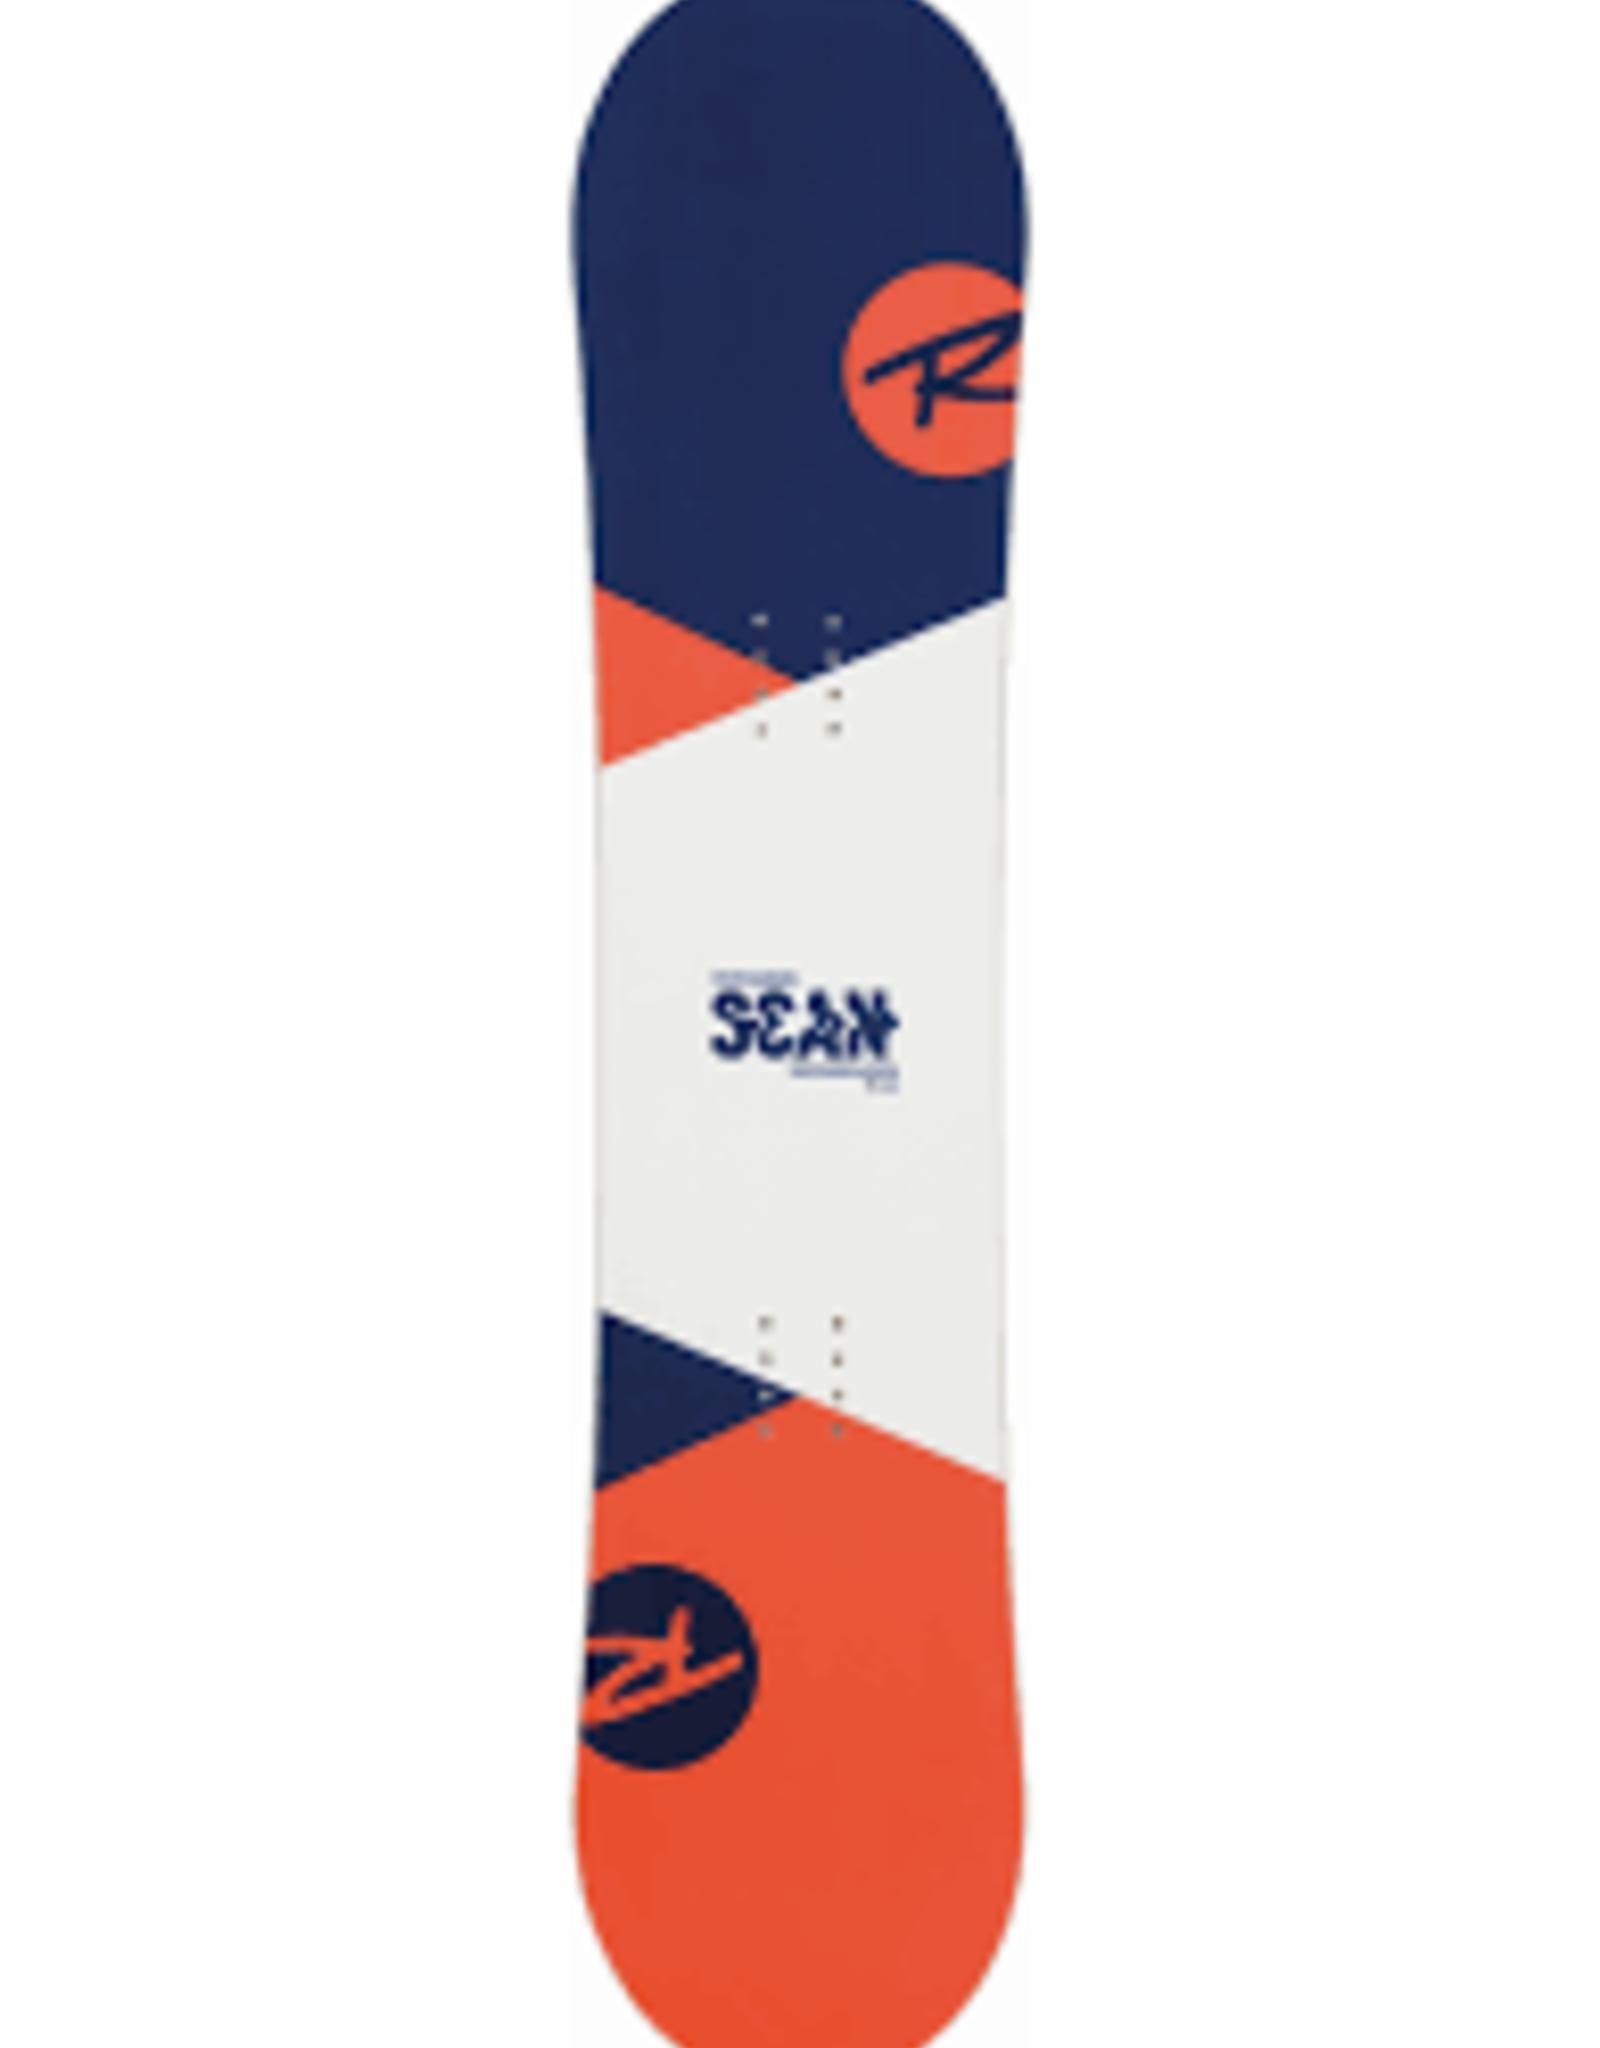 SCAN SMALLS 090